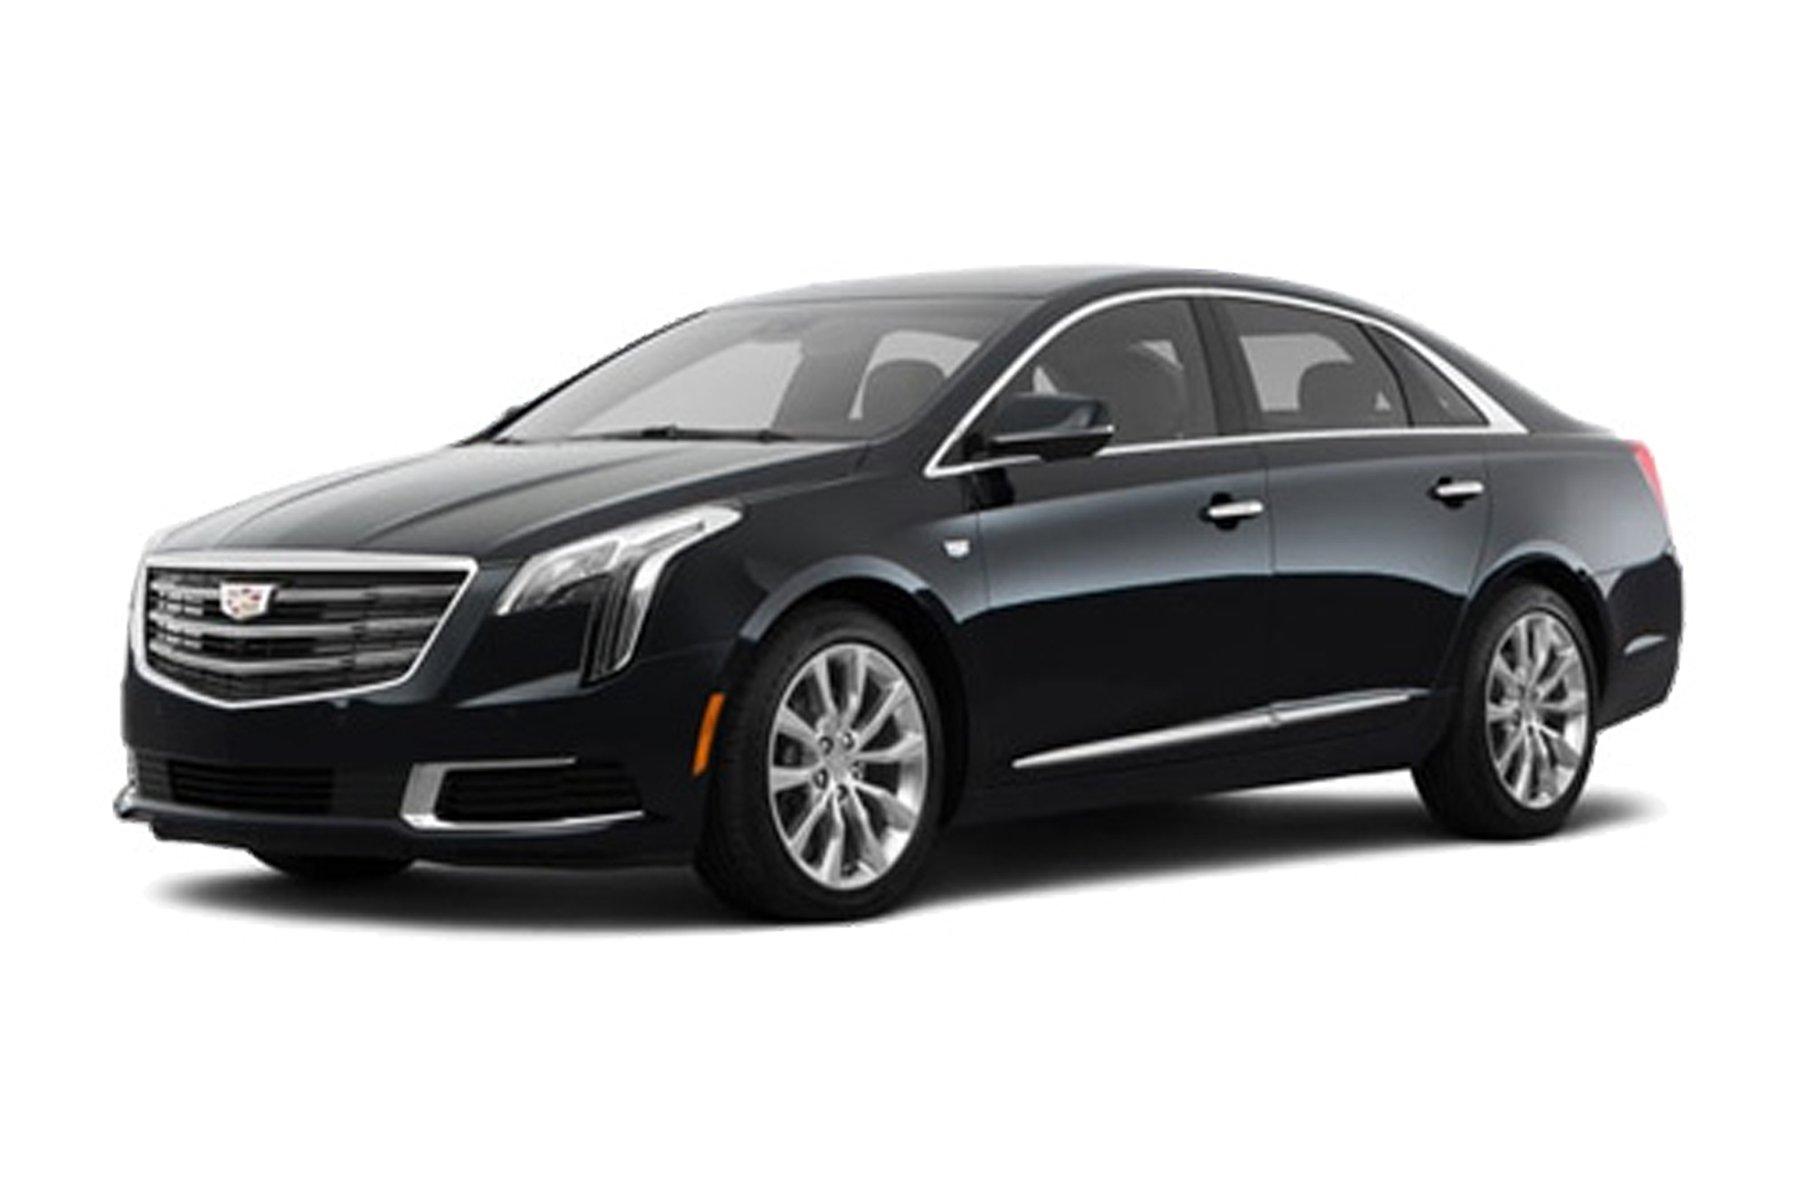 Skyline Chicago Limo Cars Luxury Fleet Black Cadillac XTS Exterior October 2020